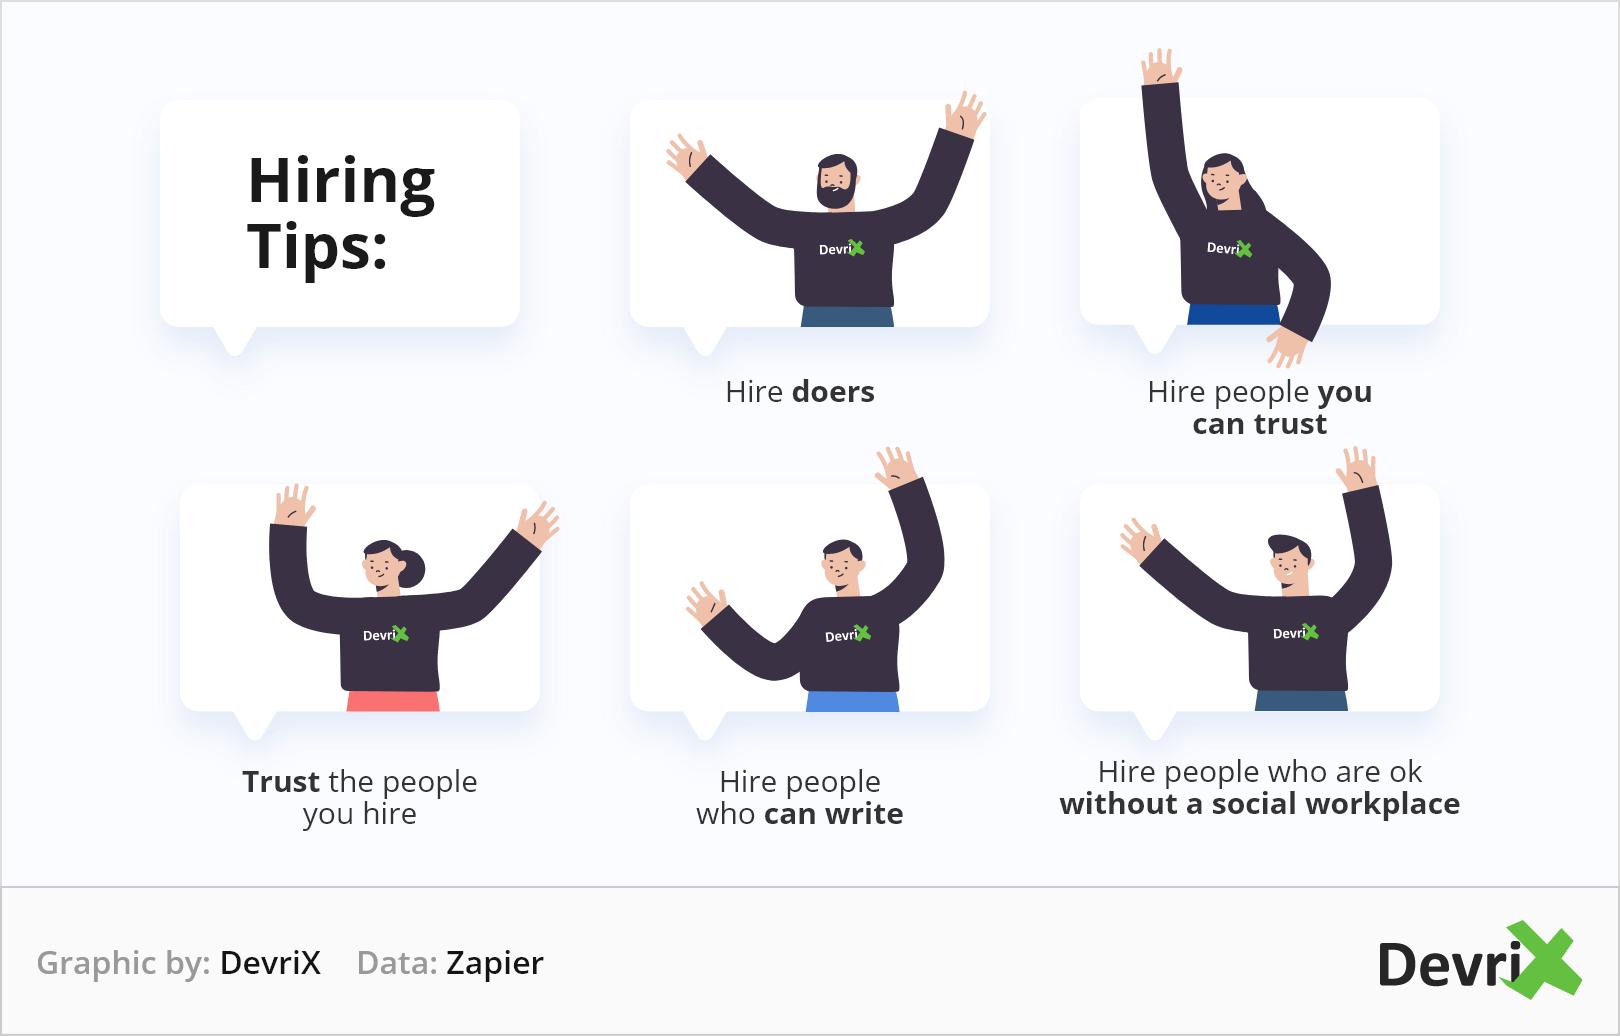 hiring-tips